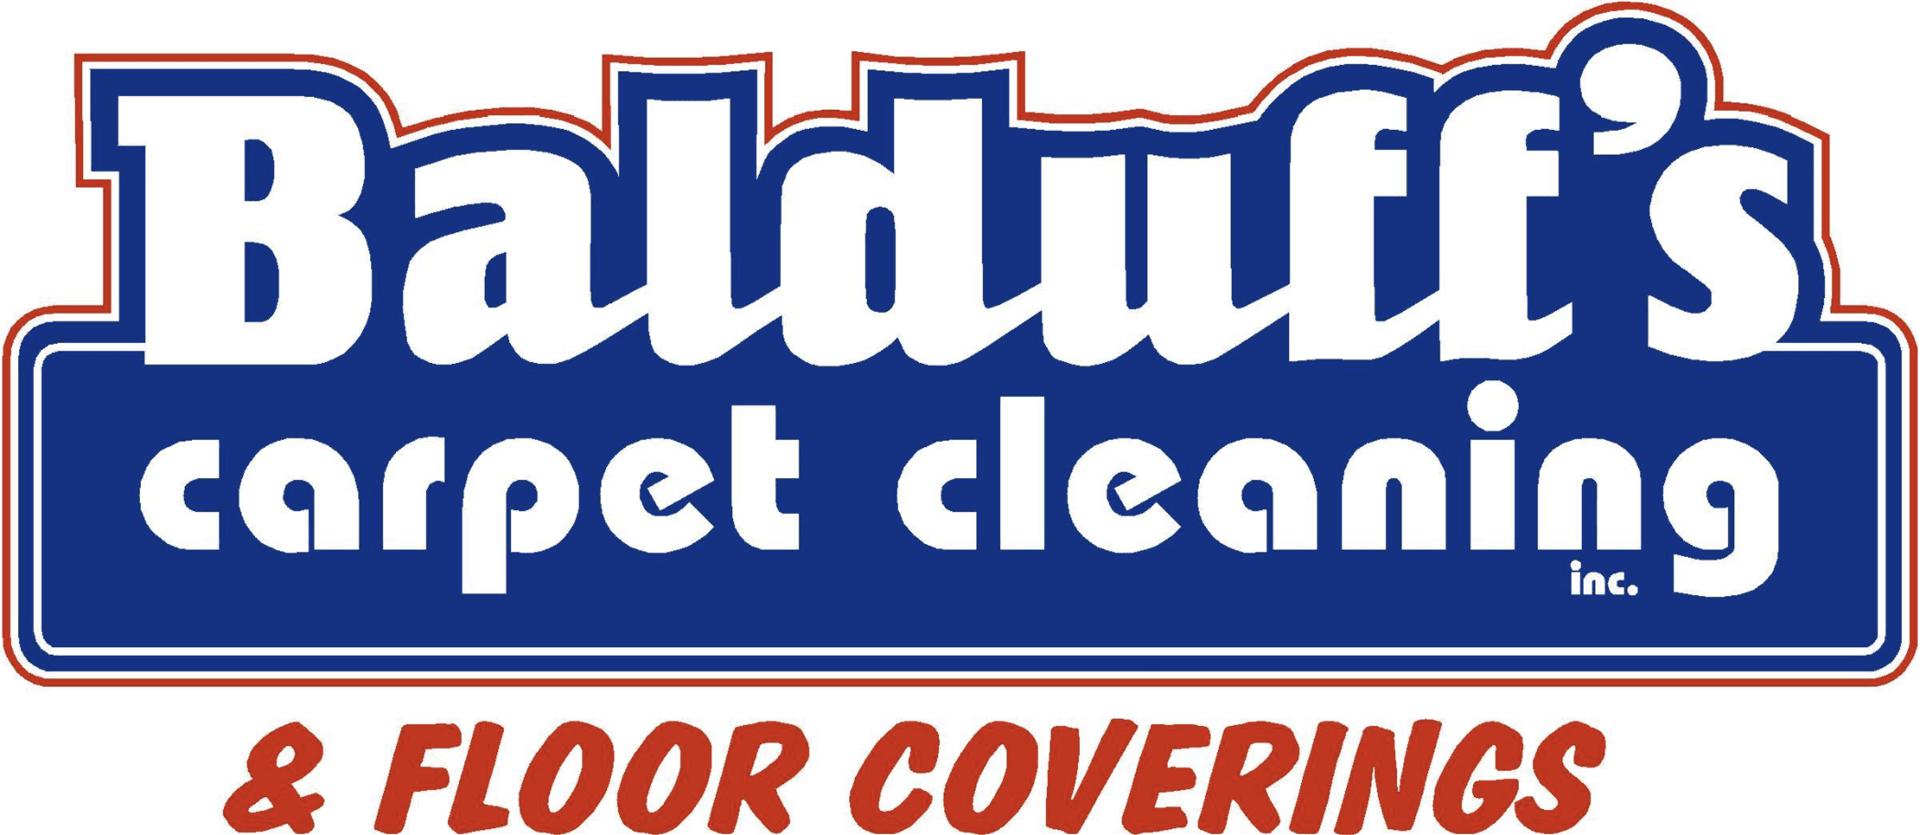 Balduffs Carpet Cleaning & Floor Covering in Norwalk, OH